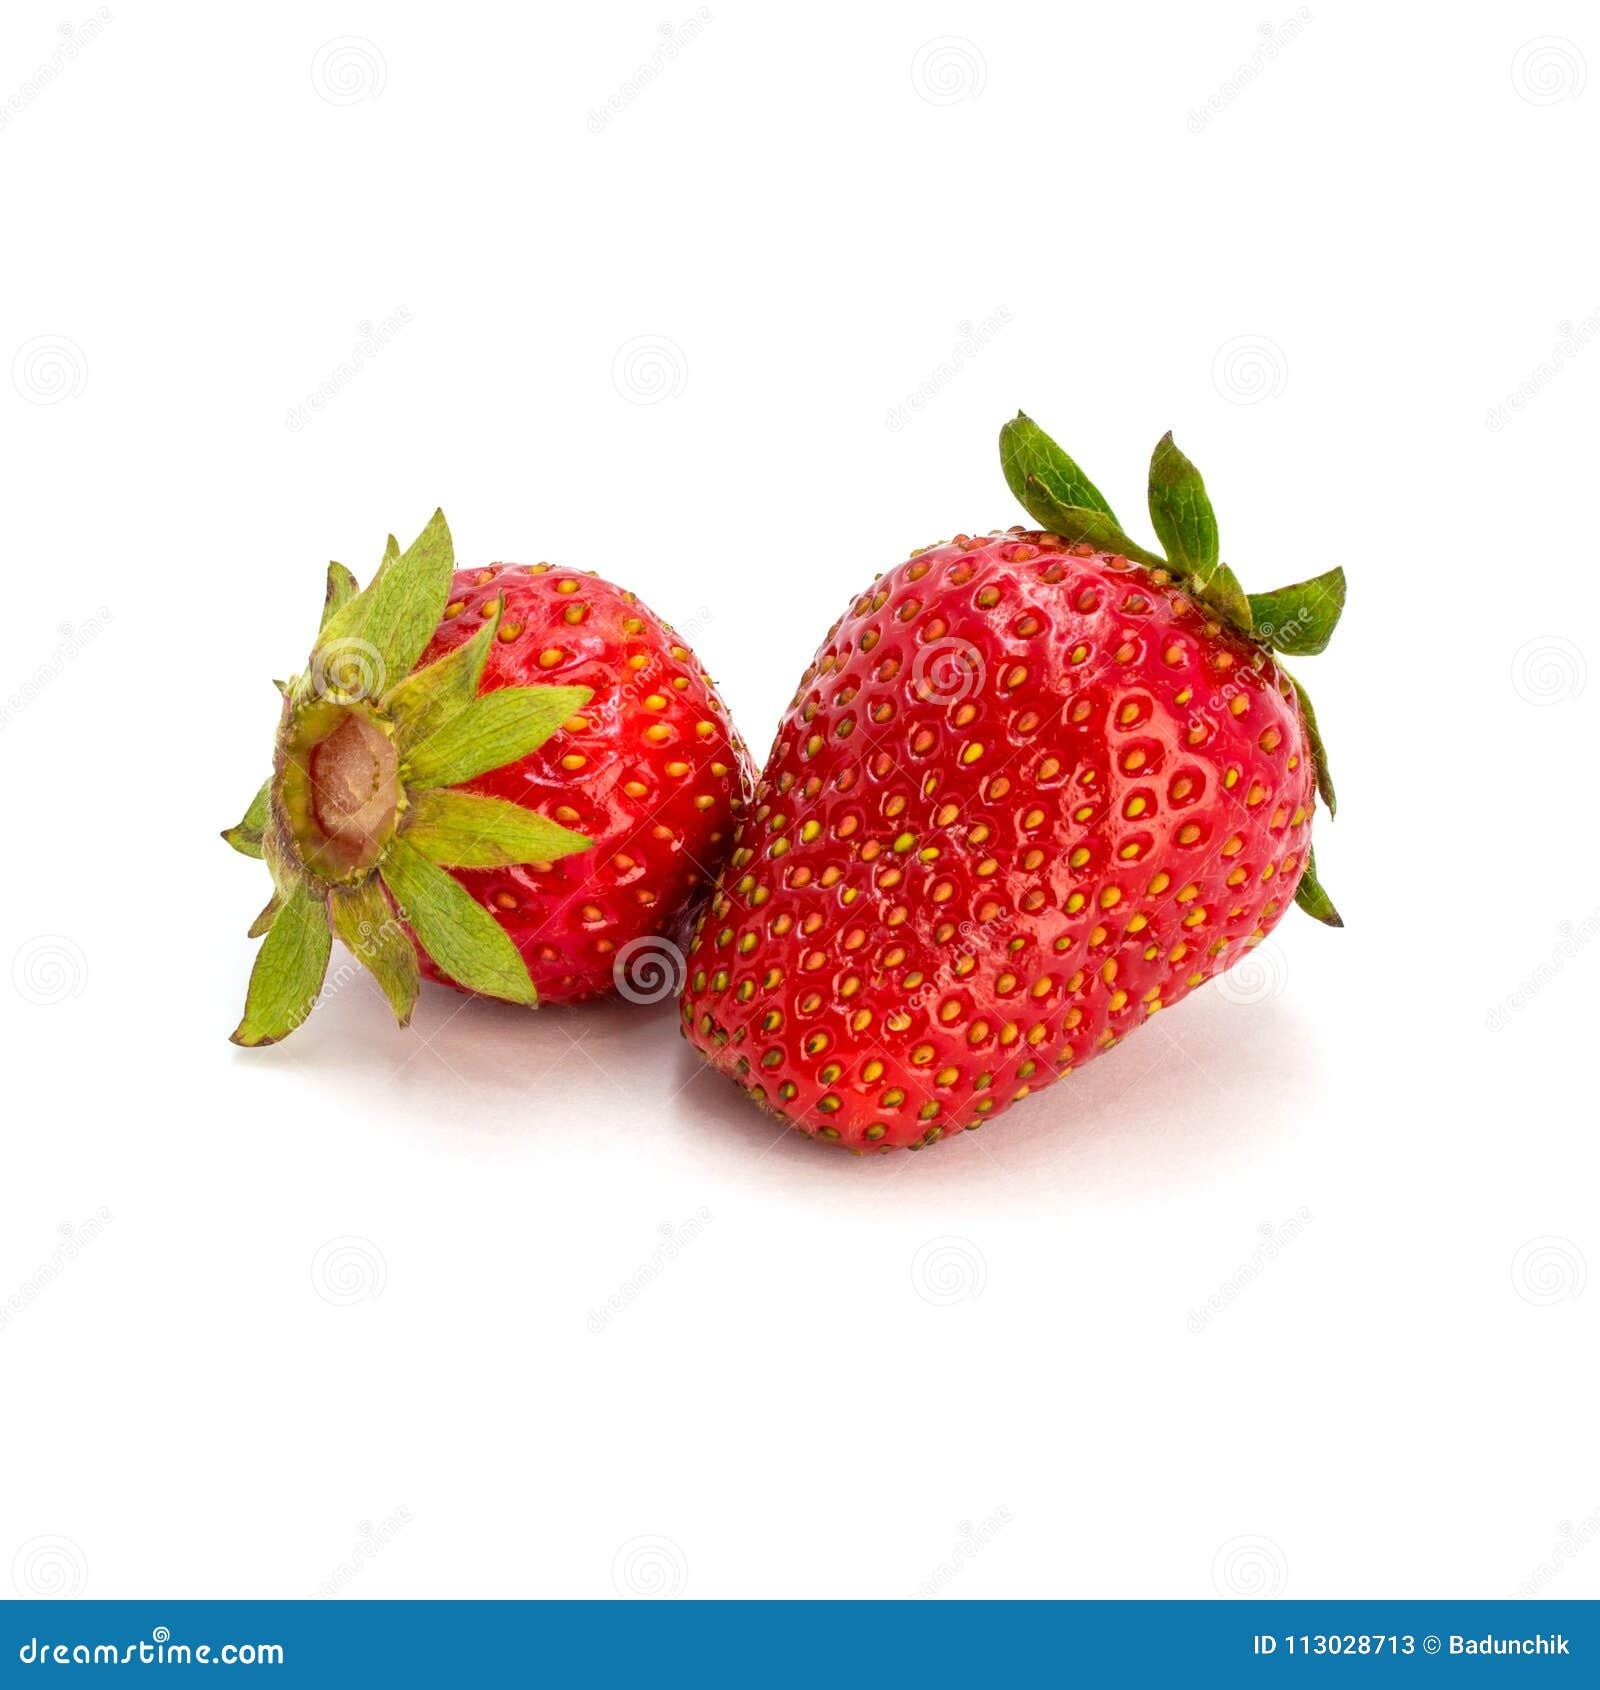 Foto de la fresa roja en el fondo blanco